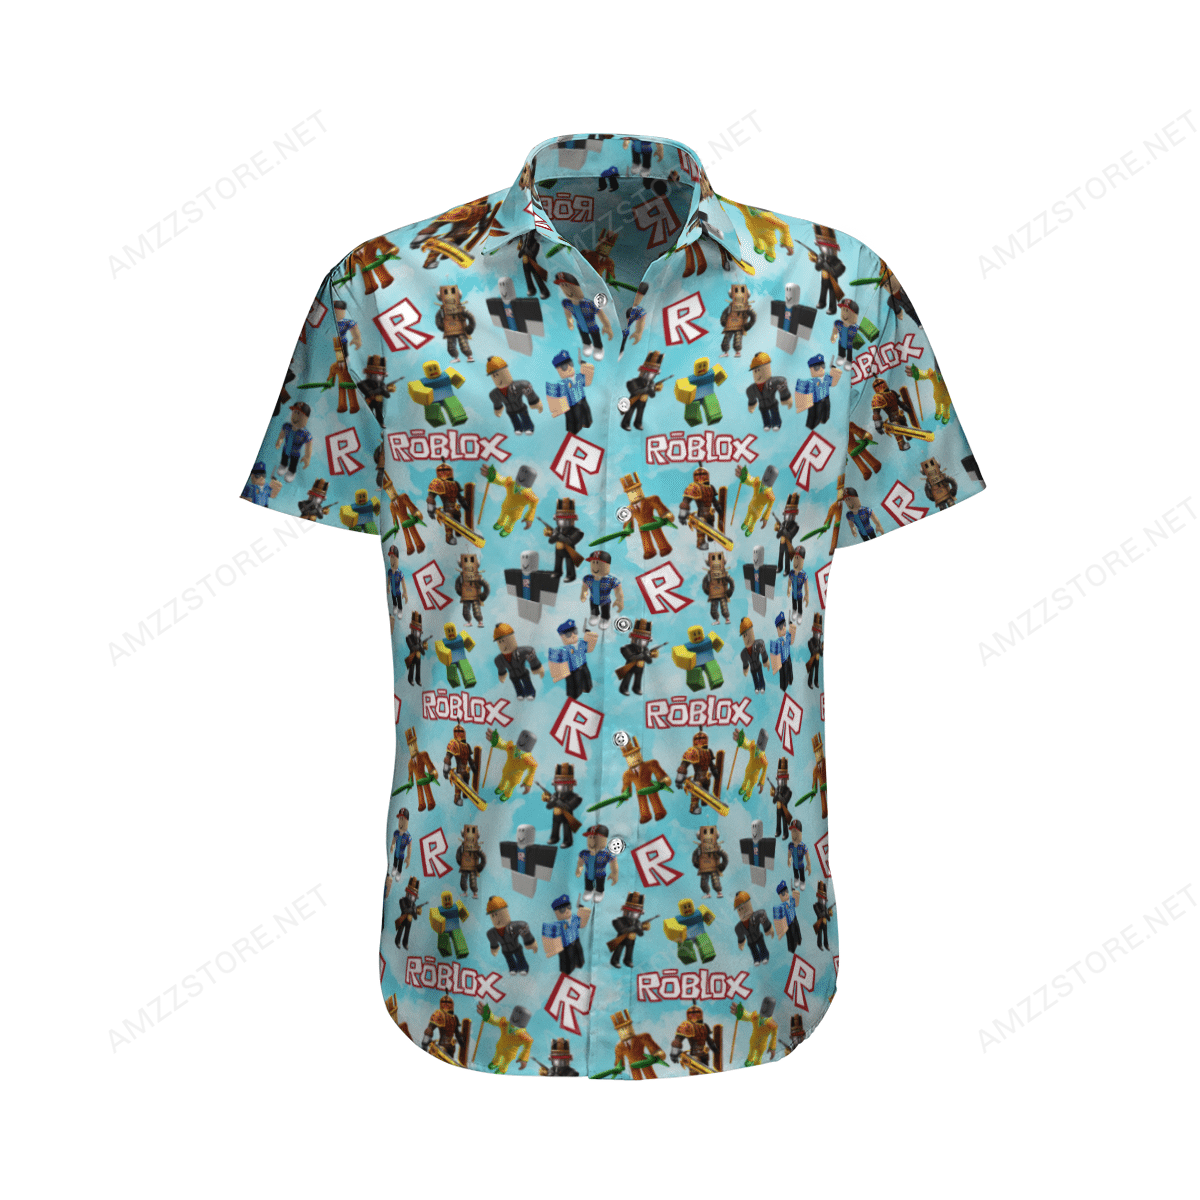 Roblox online game Hawaiian Shirt